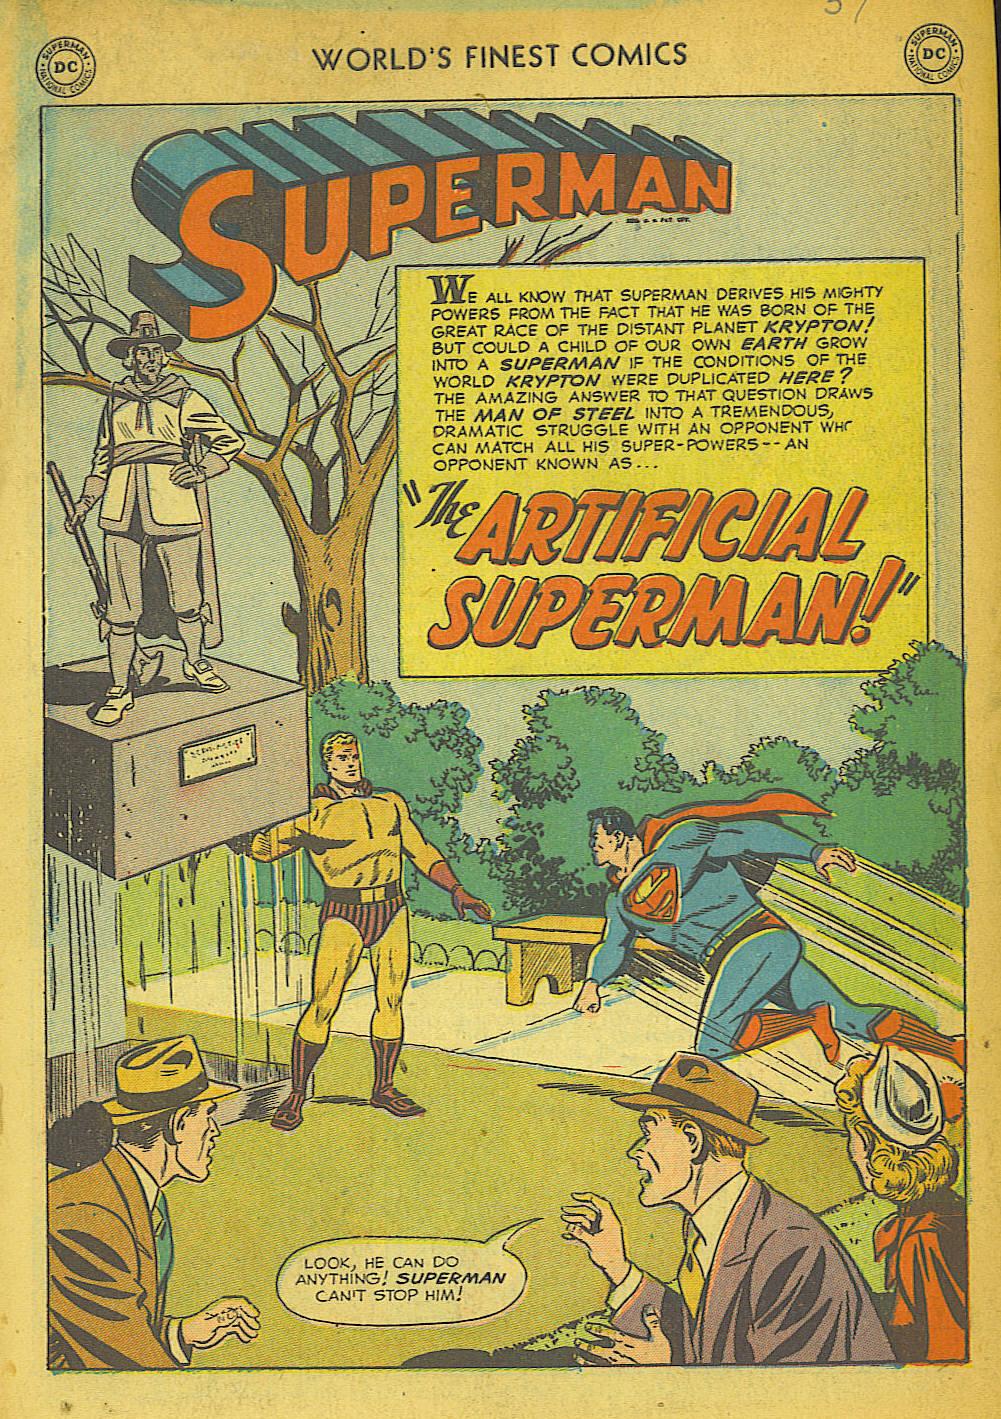 Read online World's Finest Comics comic -  Issue #57 - 3